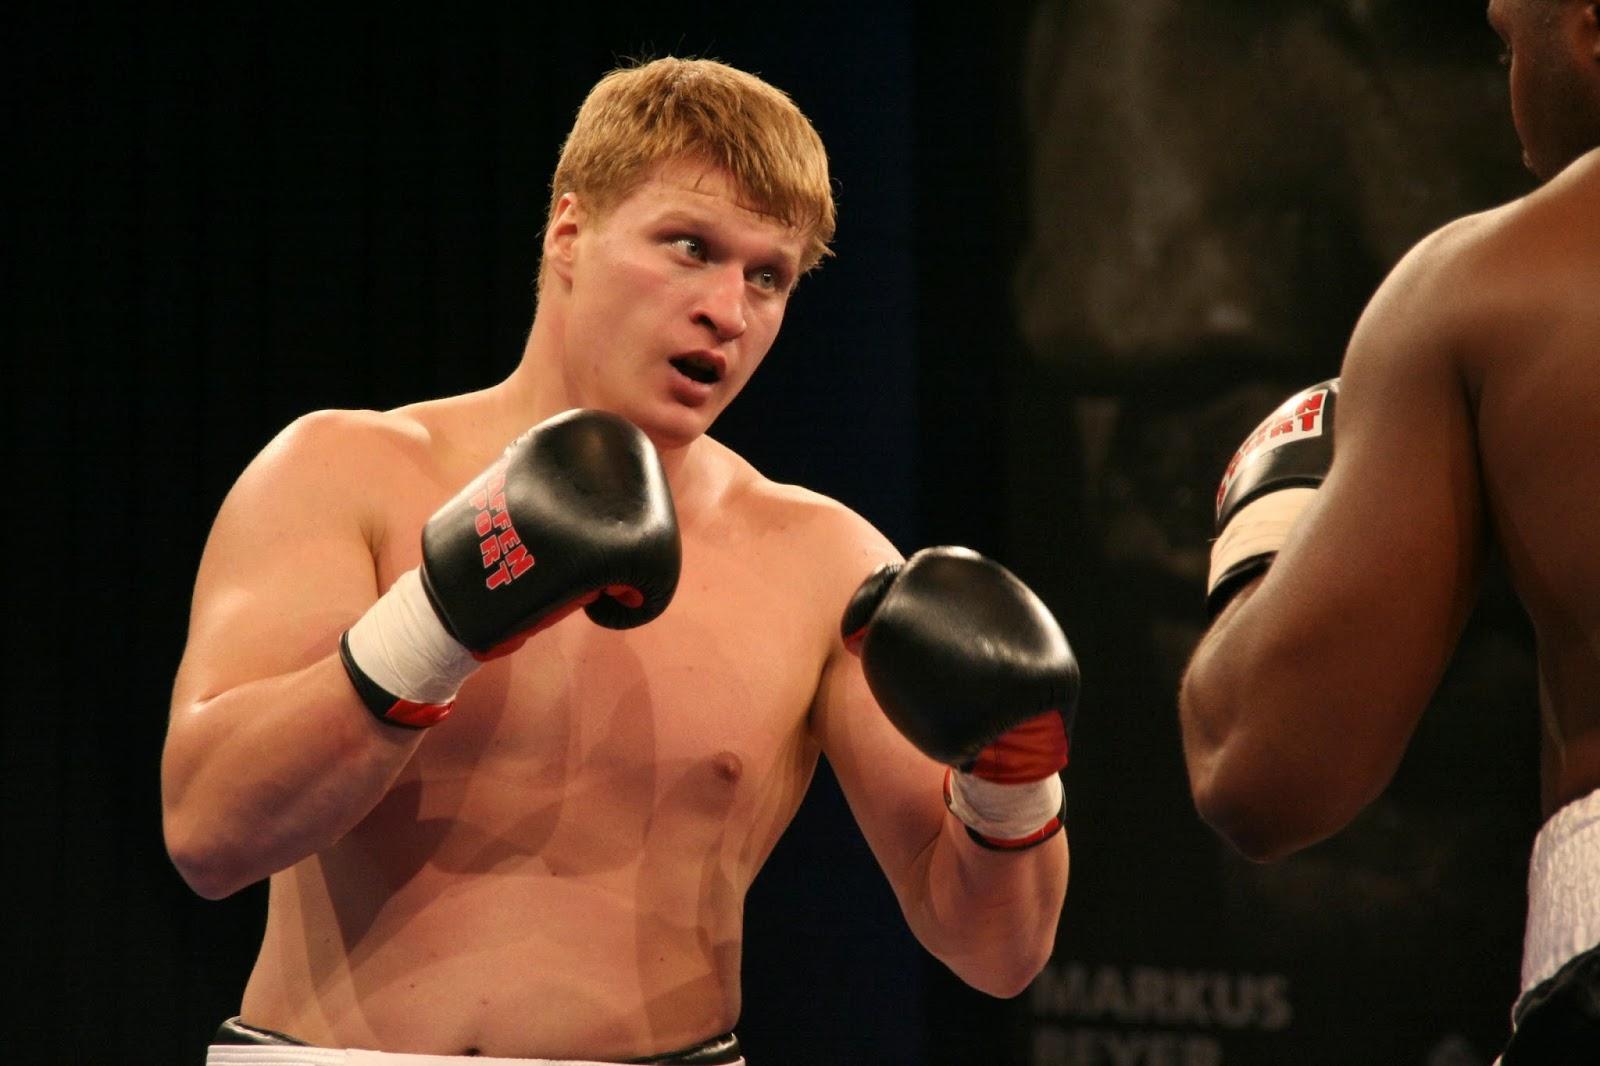 Курский боксер Александр Поветкин выйдет на ринг 1 июля